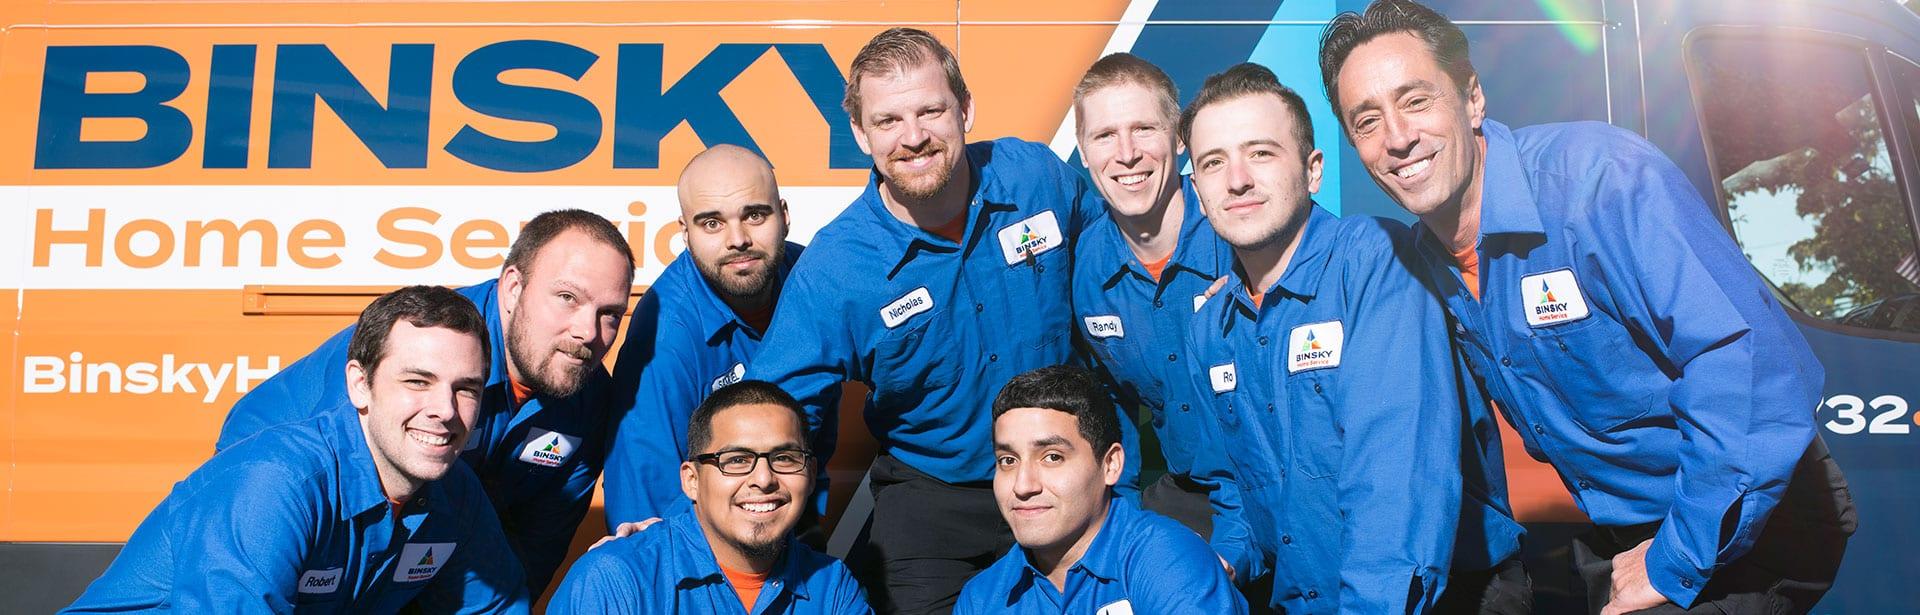 Binsky Home Service. Emergency Services